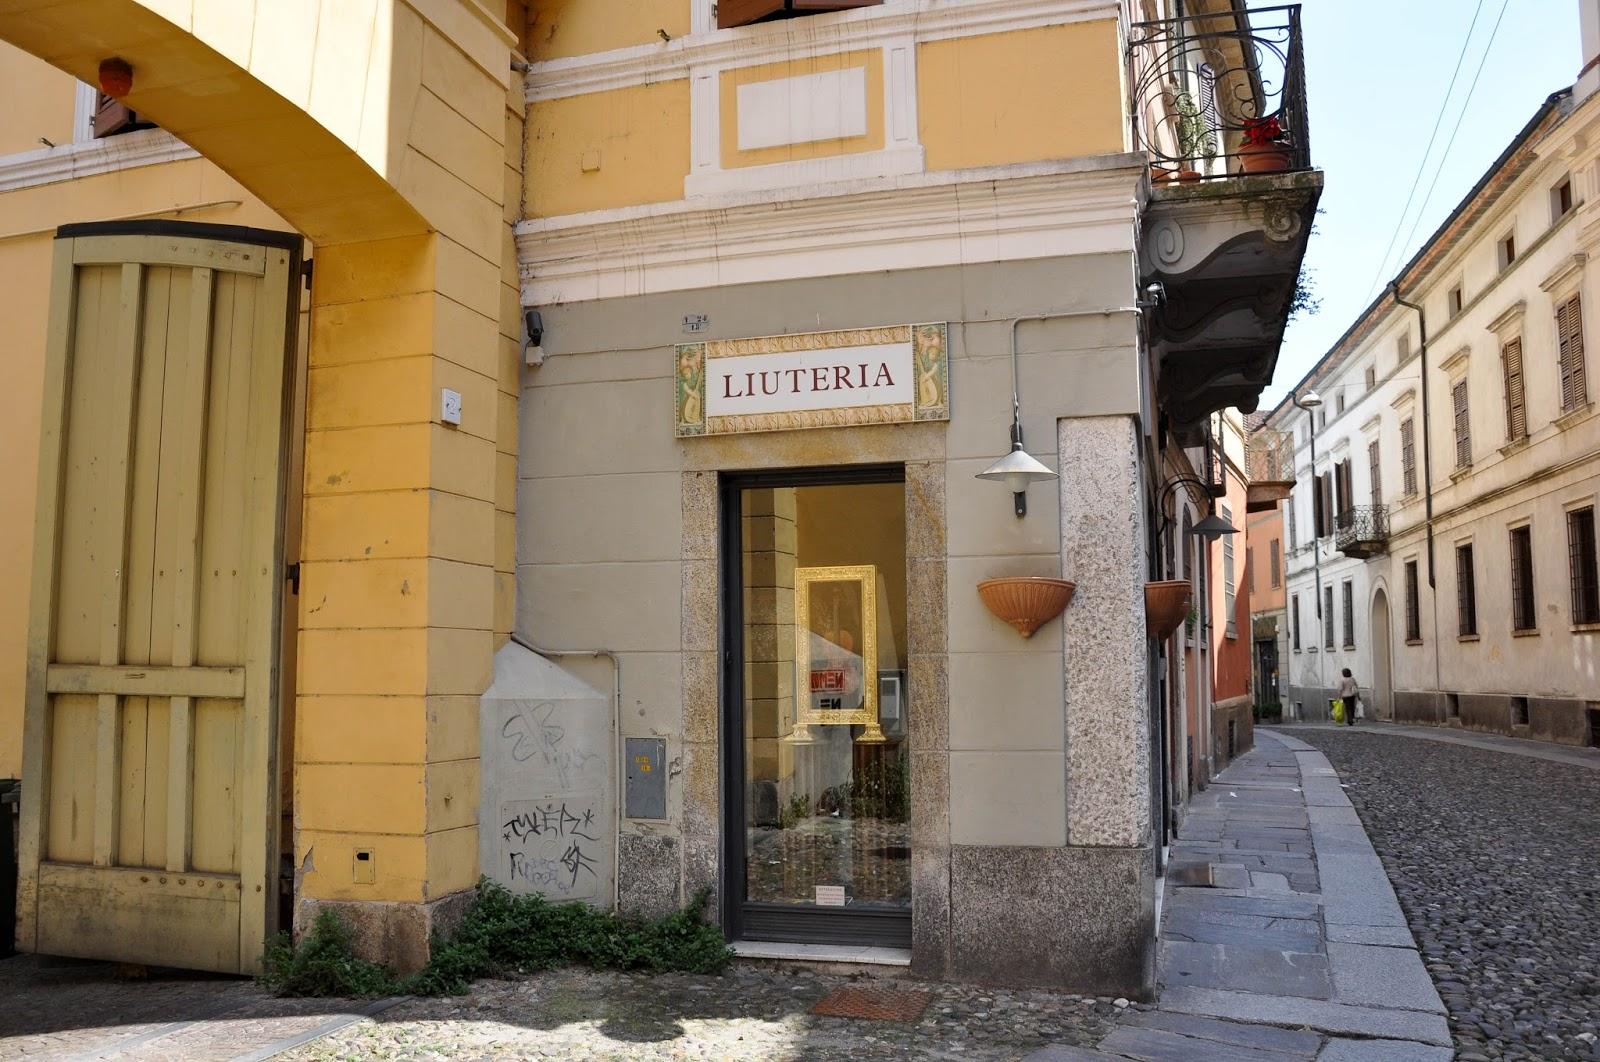 Liuteria, Cremona, Italy